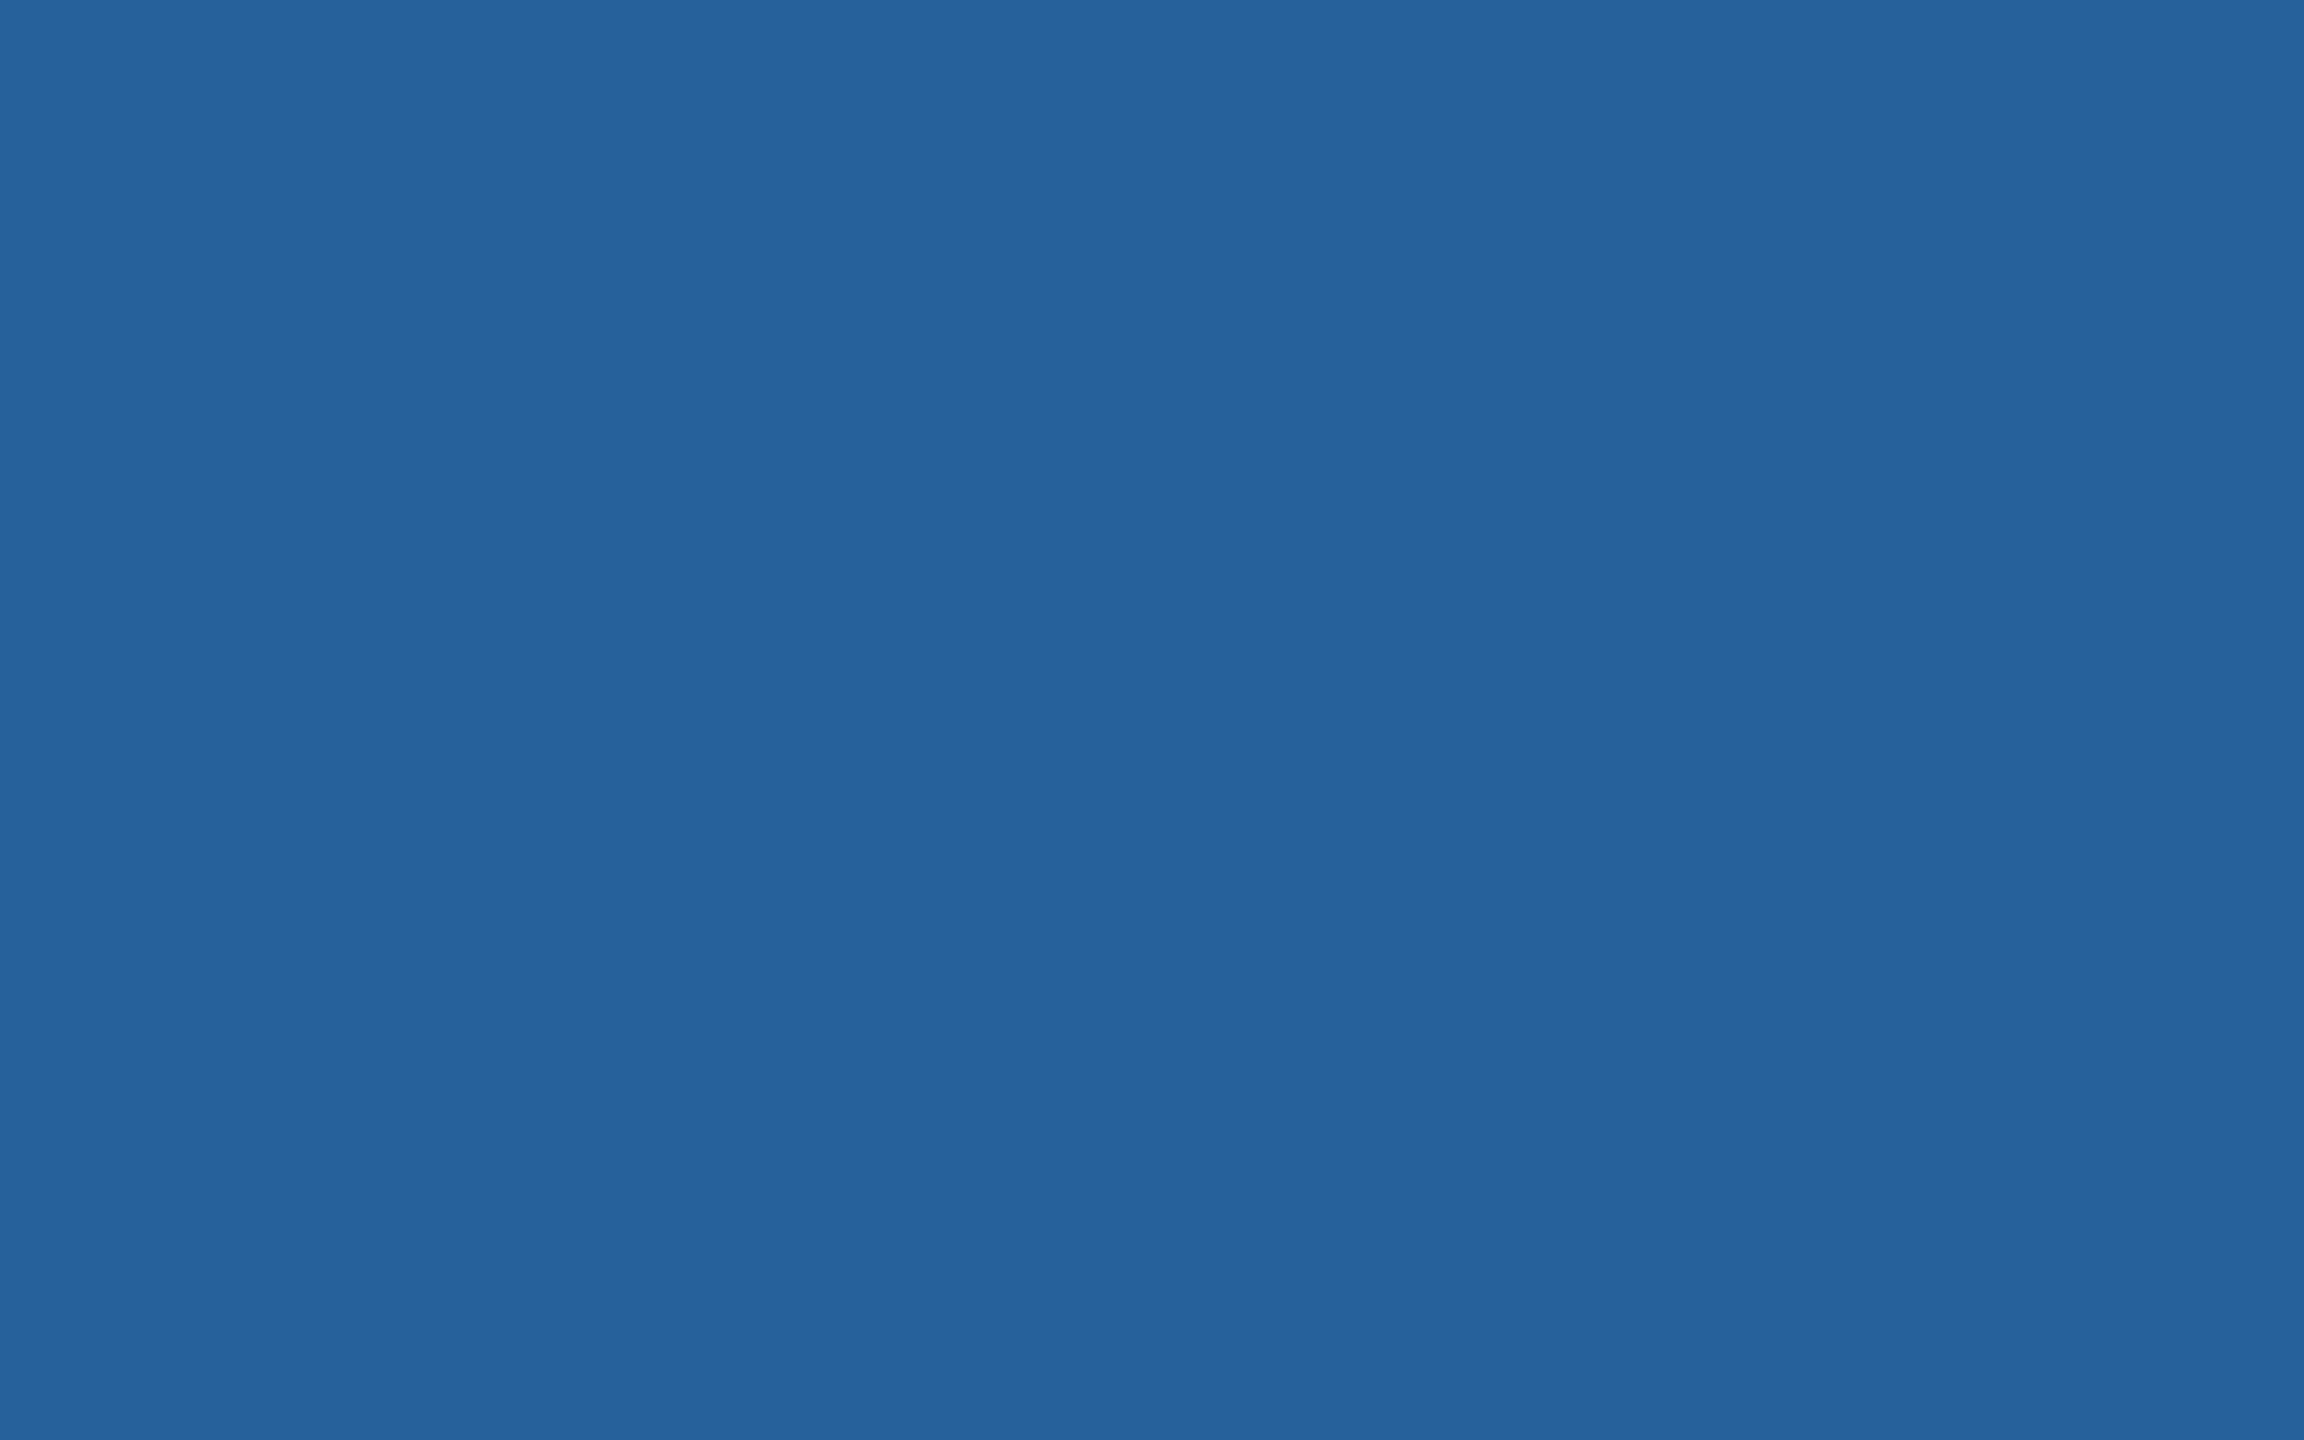 2304x1440 Lapis Lazuli Solid Color Background